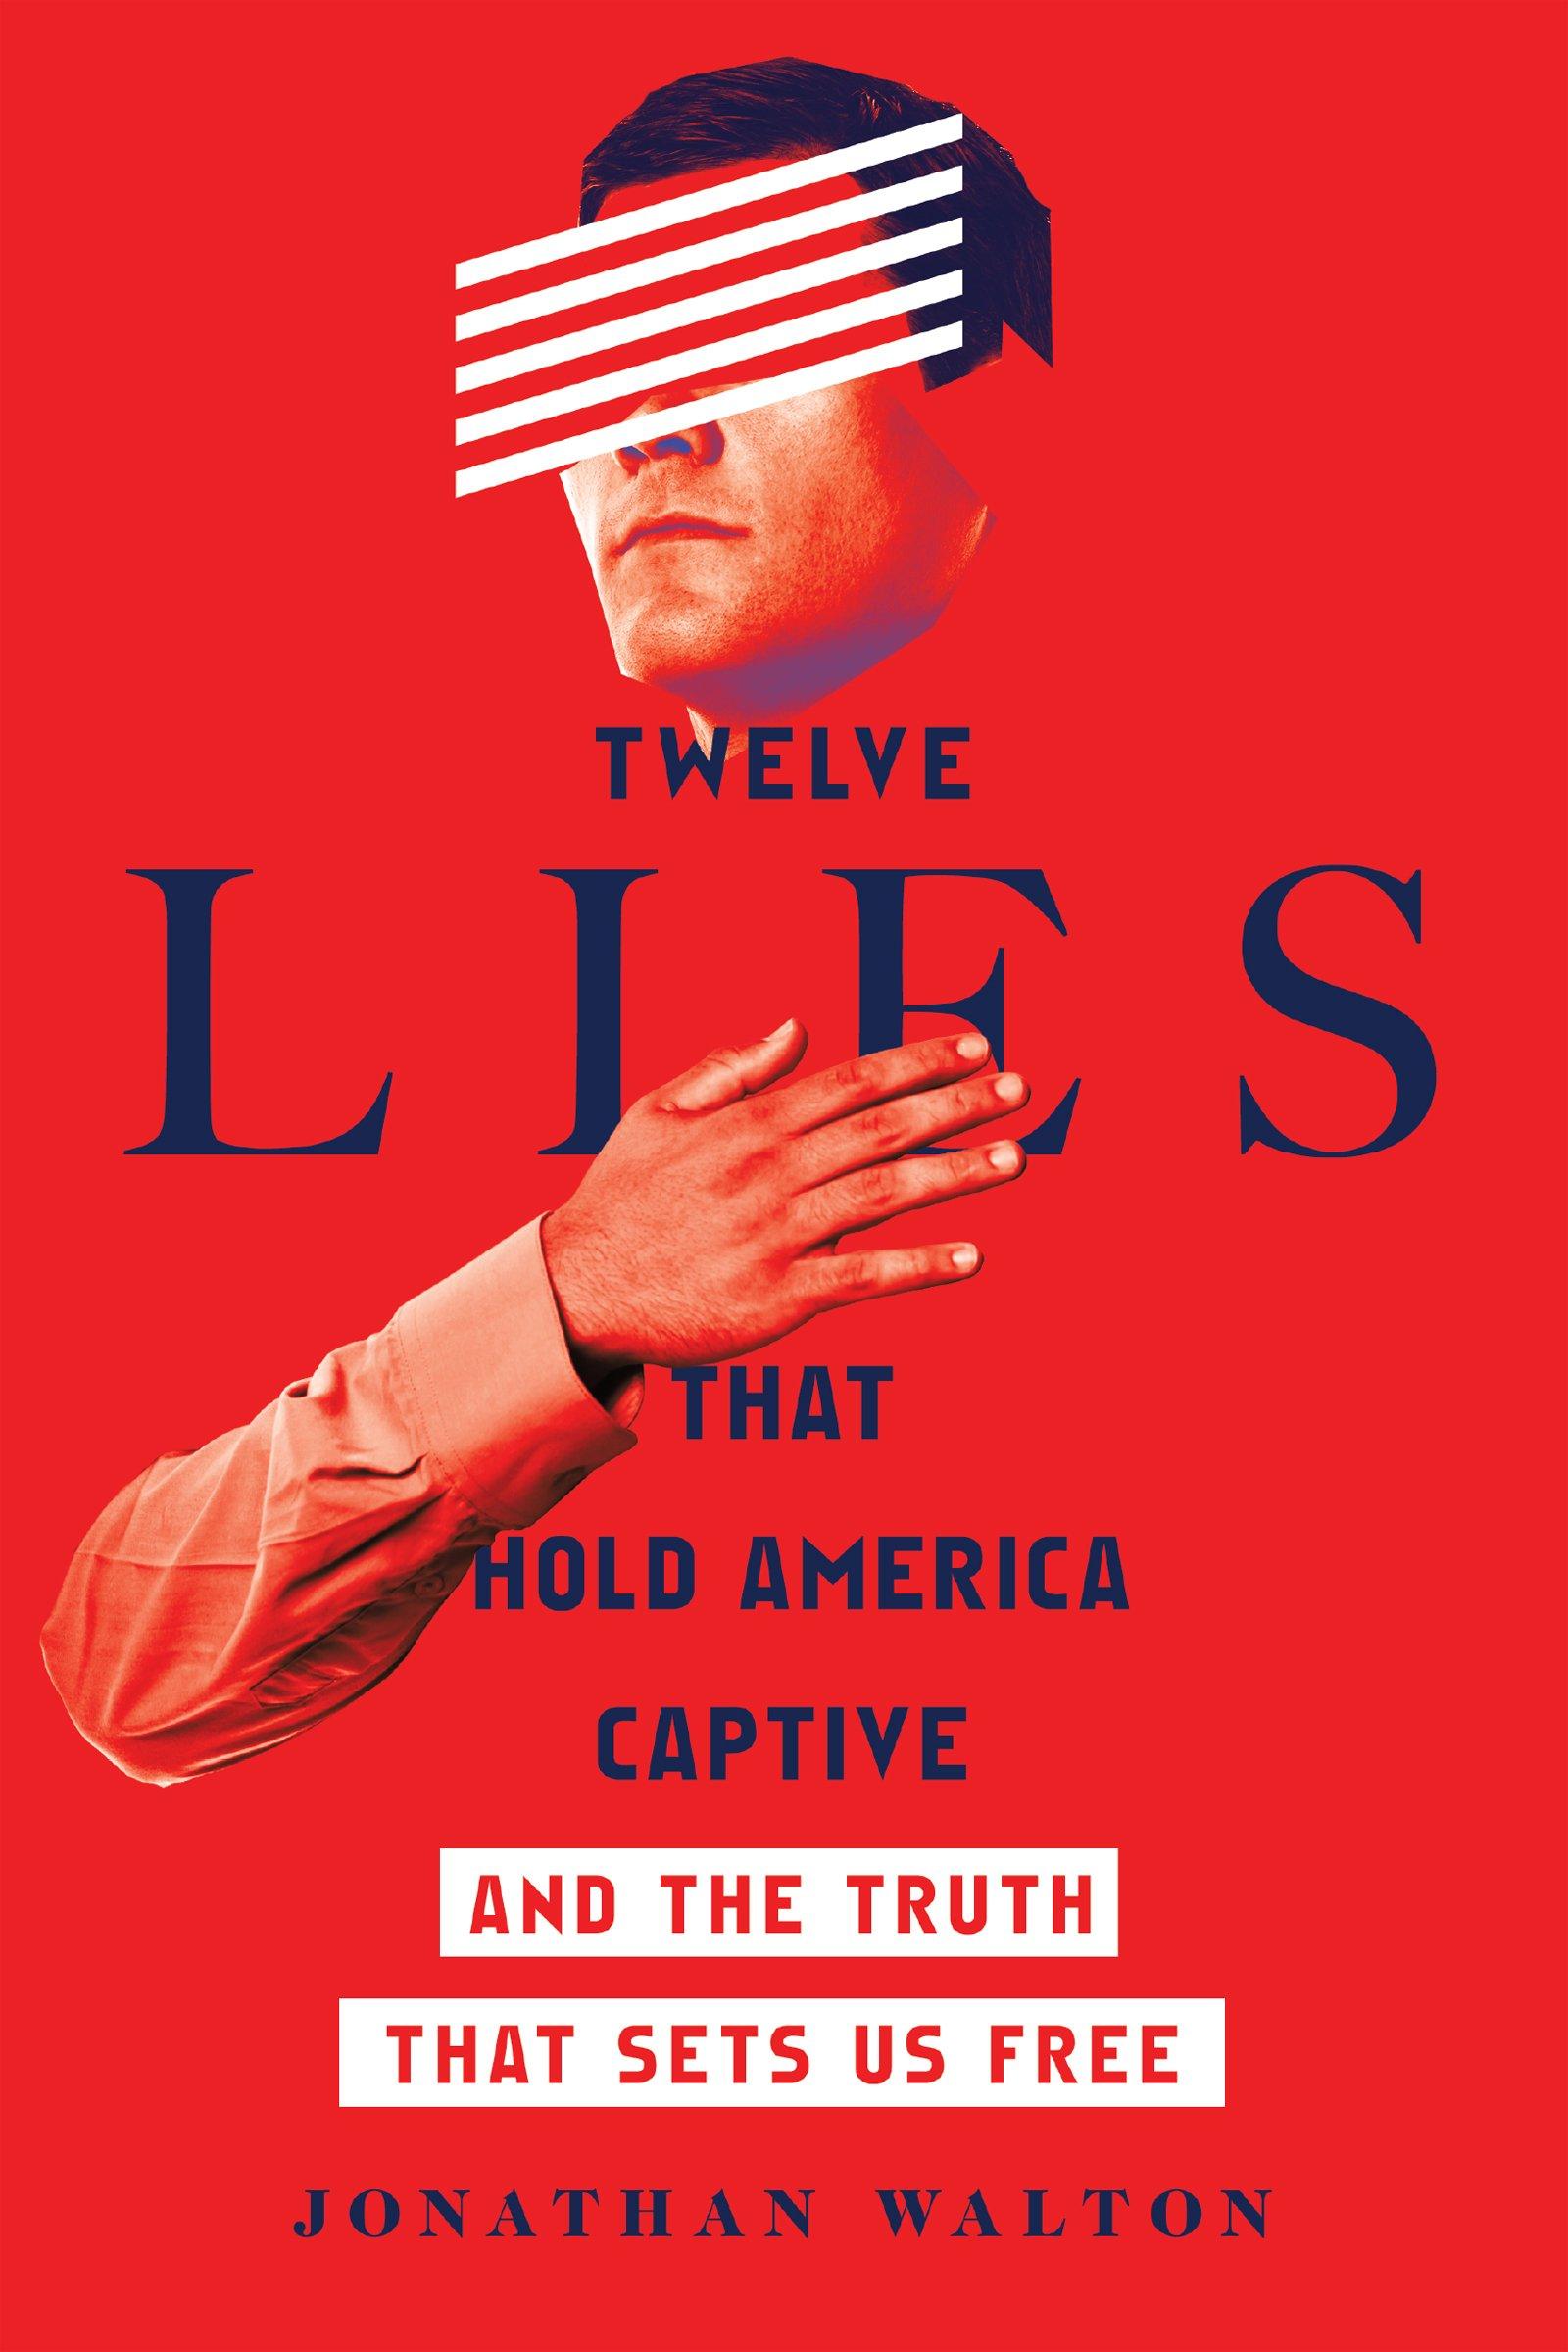 Amazon.com: Twelve Lies That Hold America Captive: And the Truth That Sets  Us Free (9780830845583): Jonathan Walton, Greg Jao: Books